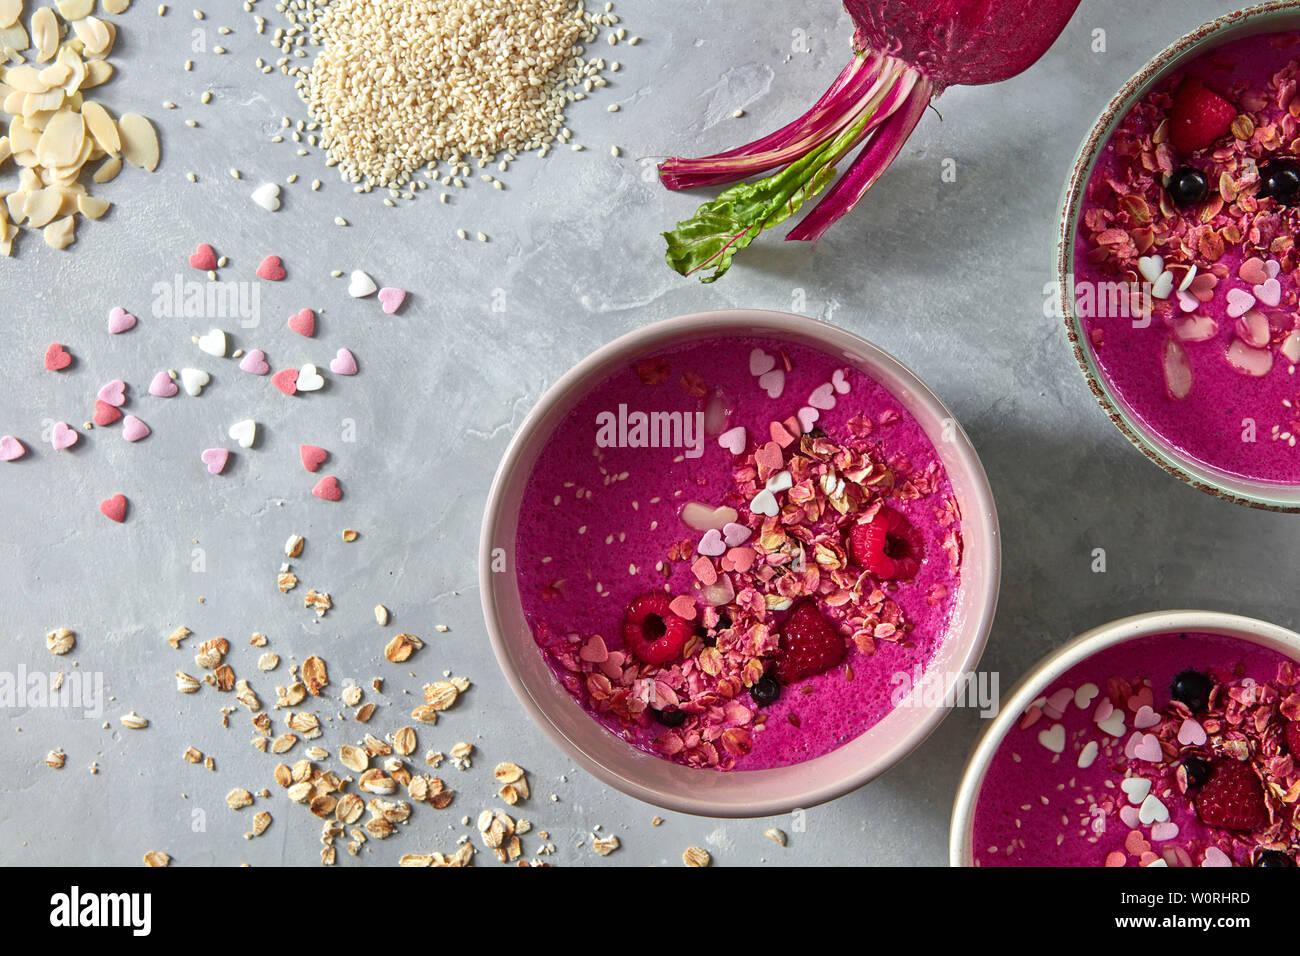 healthy diet,breakfast,smoothie - Stock Image